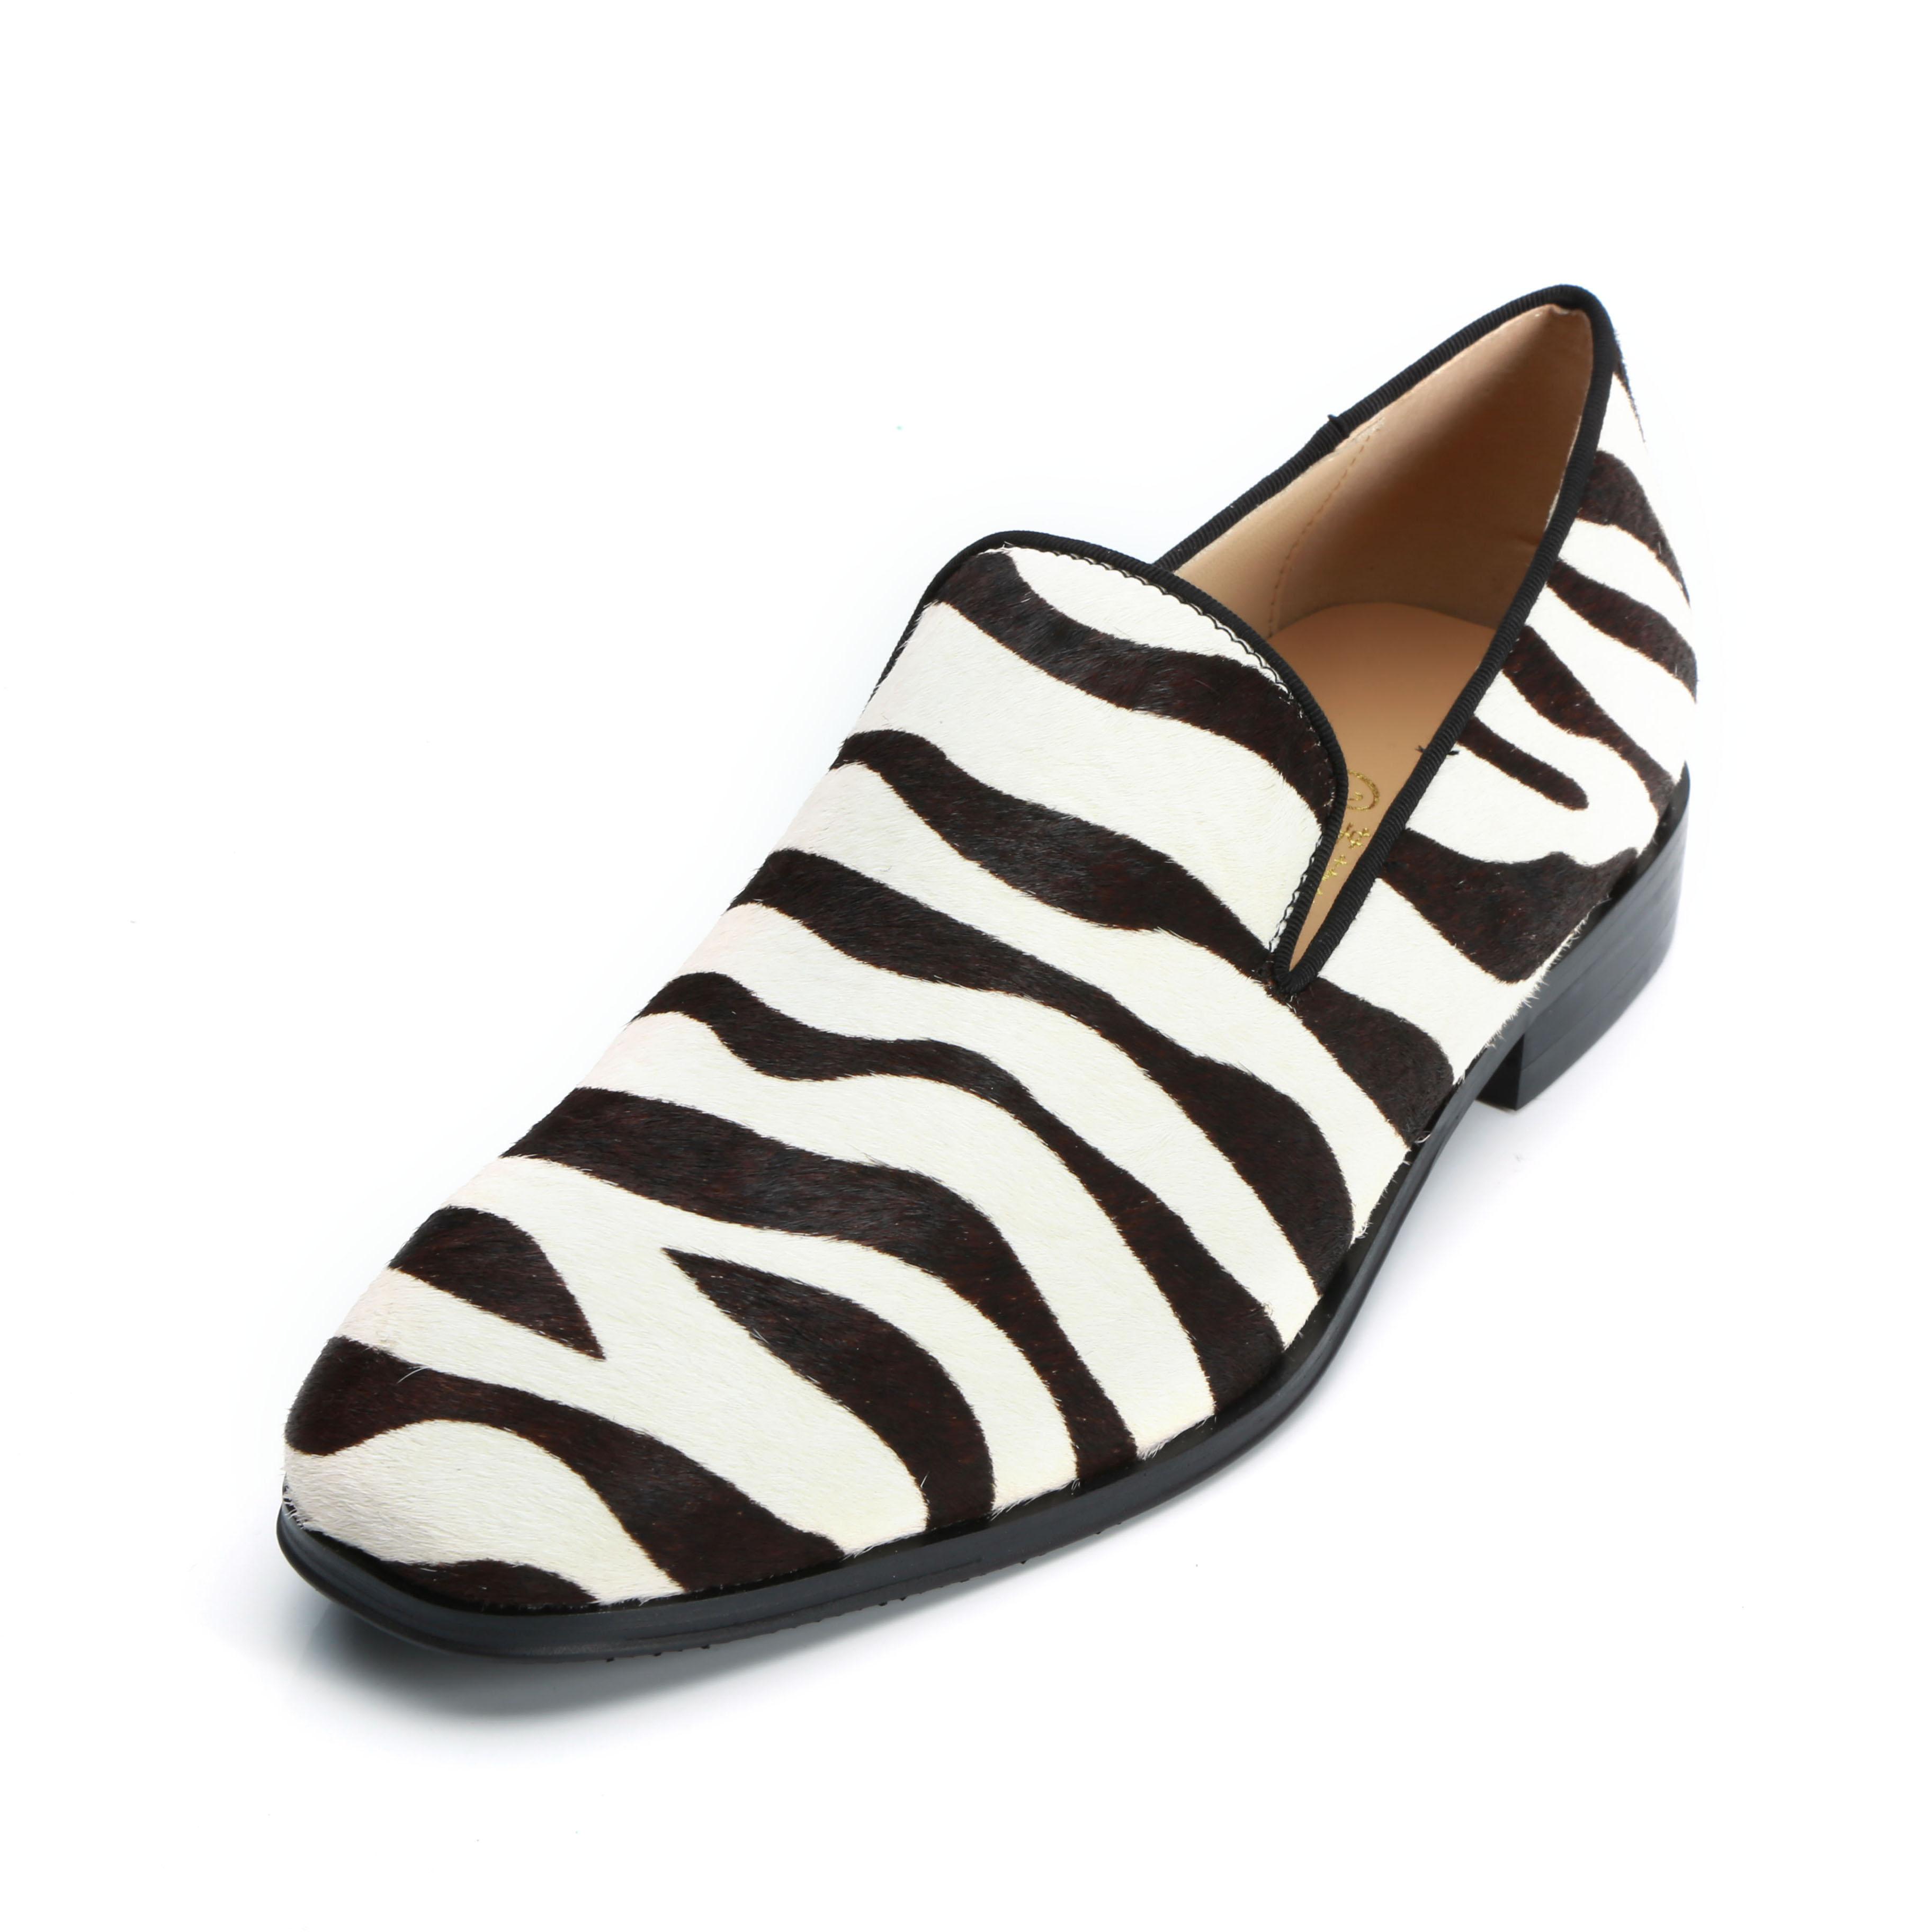 Spring leopard zebra print leather men dress shoes slip on flats fashion Men Loafers shoes